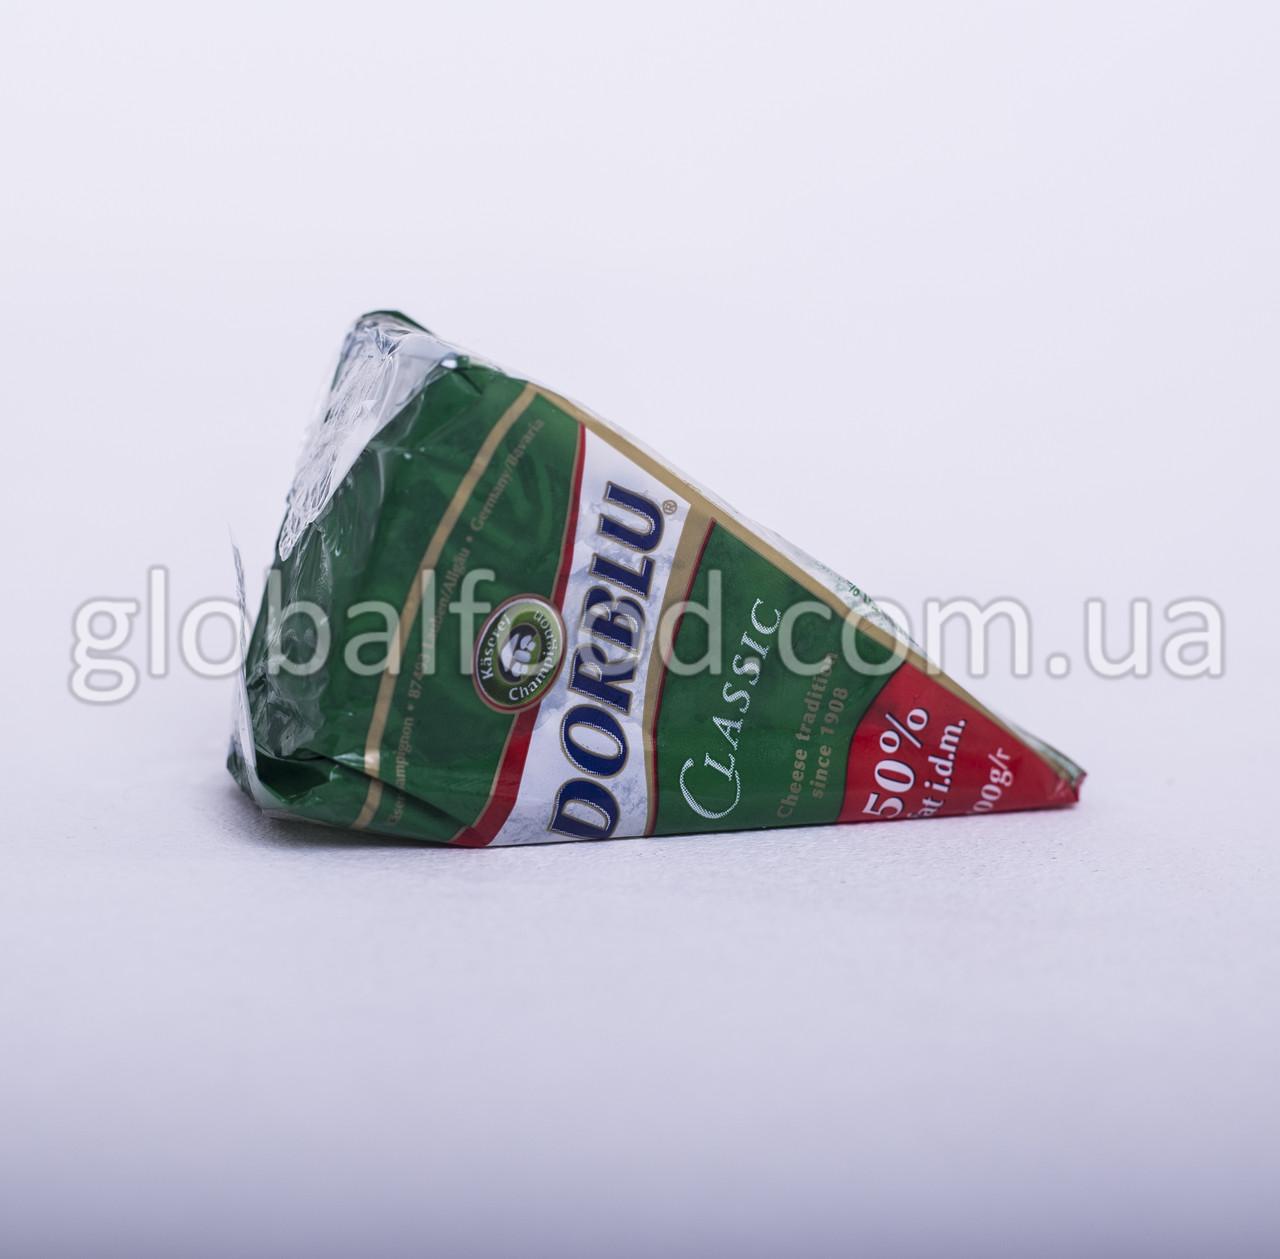 Сыр Дорблю Классик Dorblu Classic 100гр